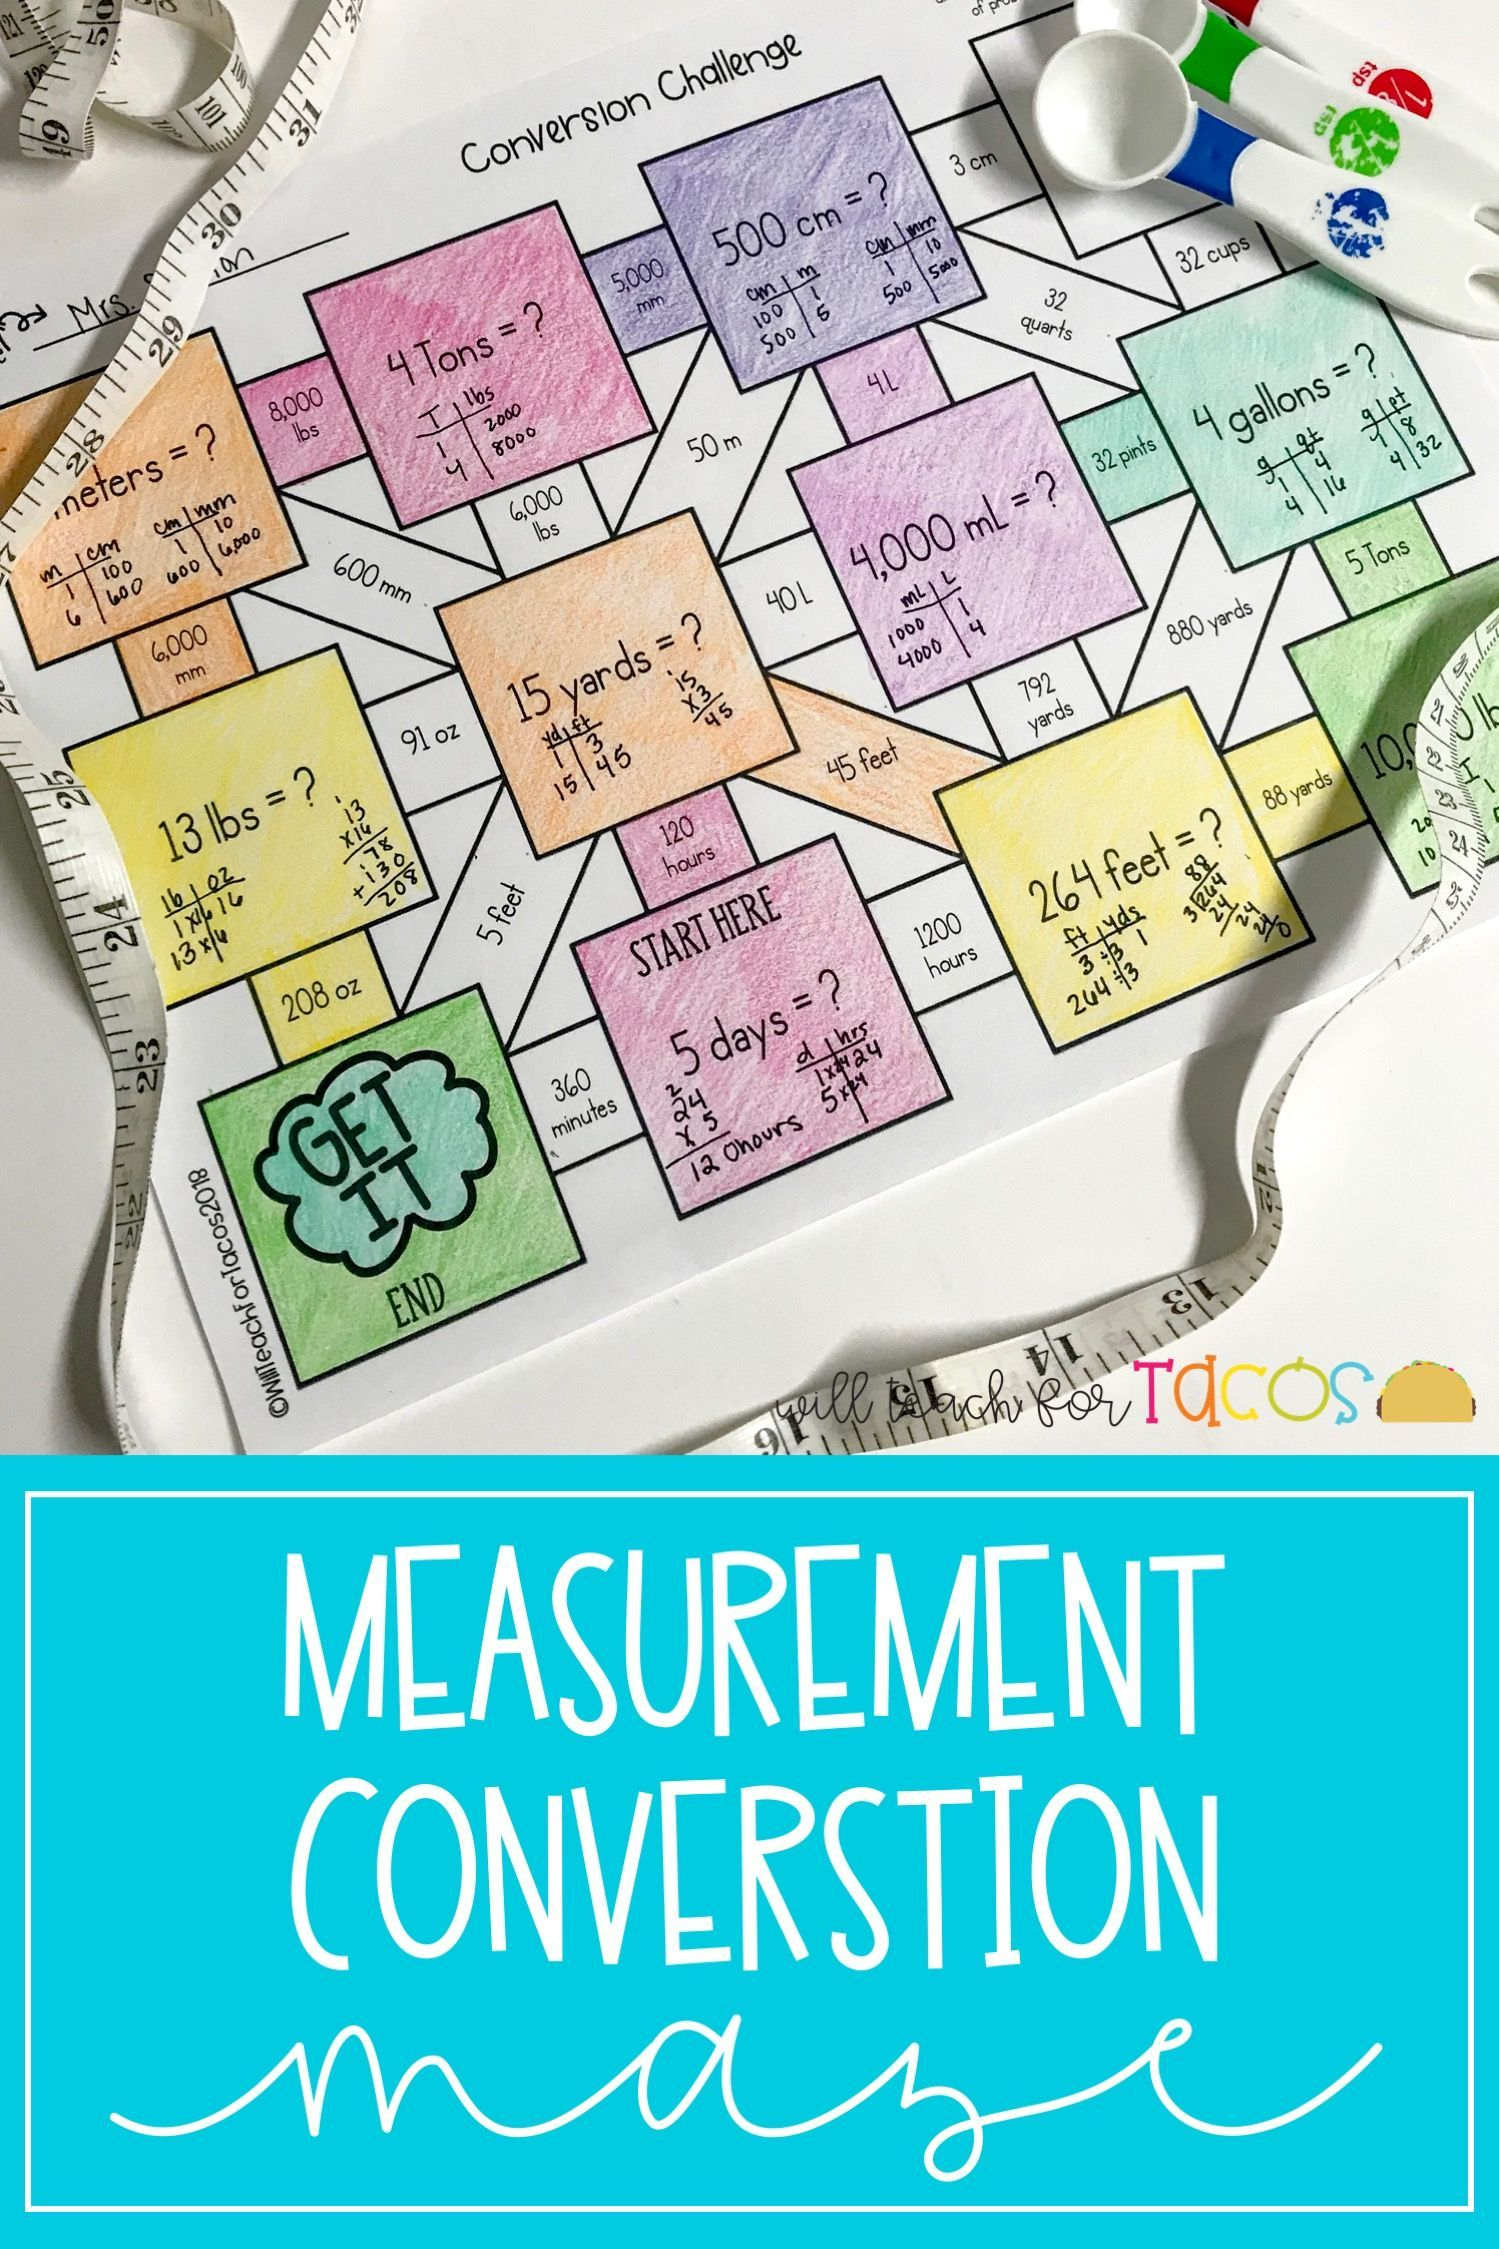 Measurement Conversions Maze 4 8b 5 7a